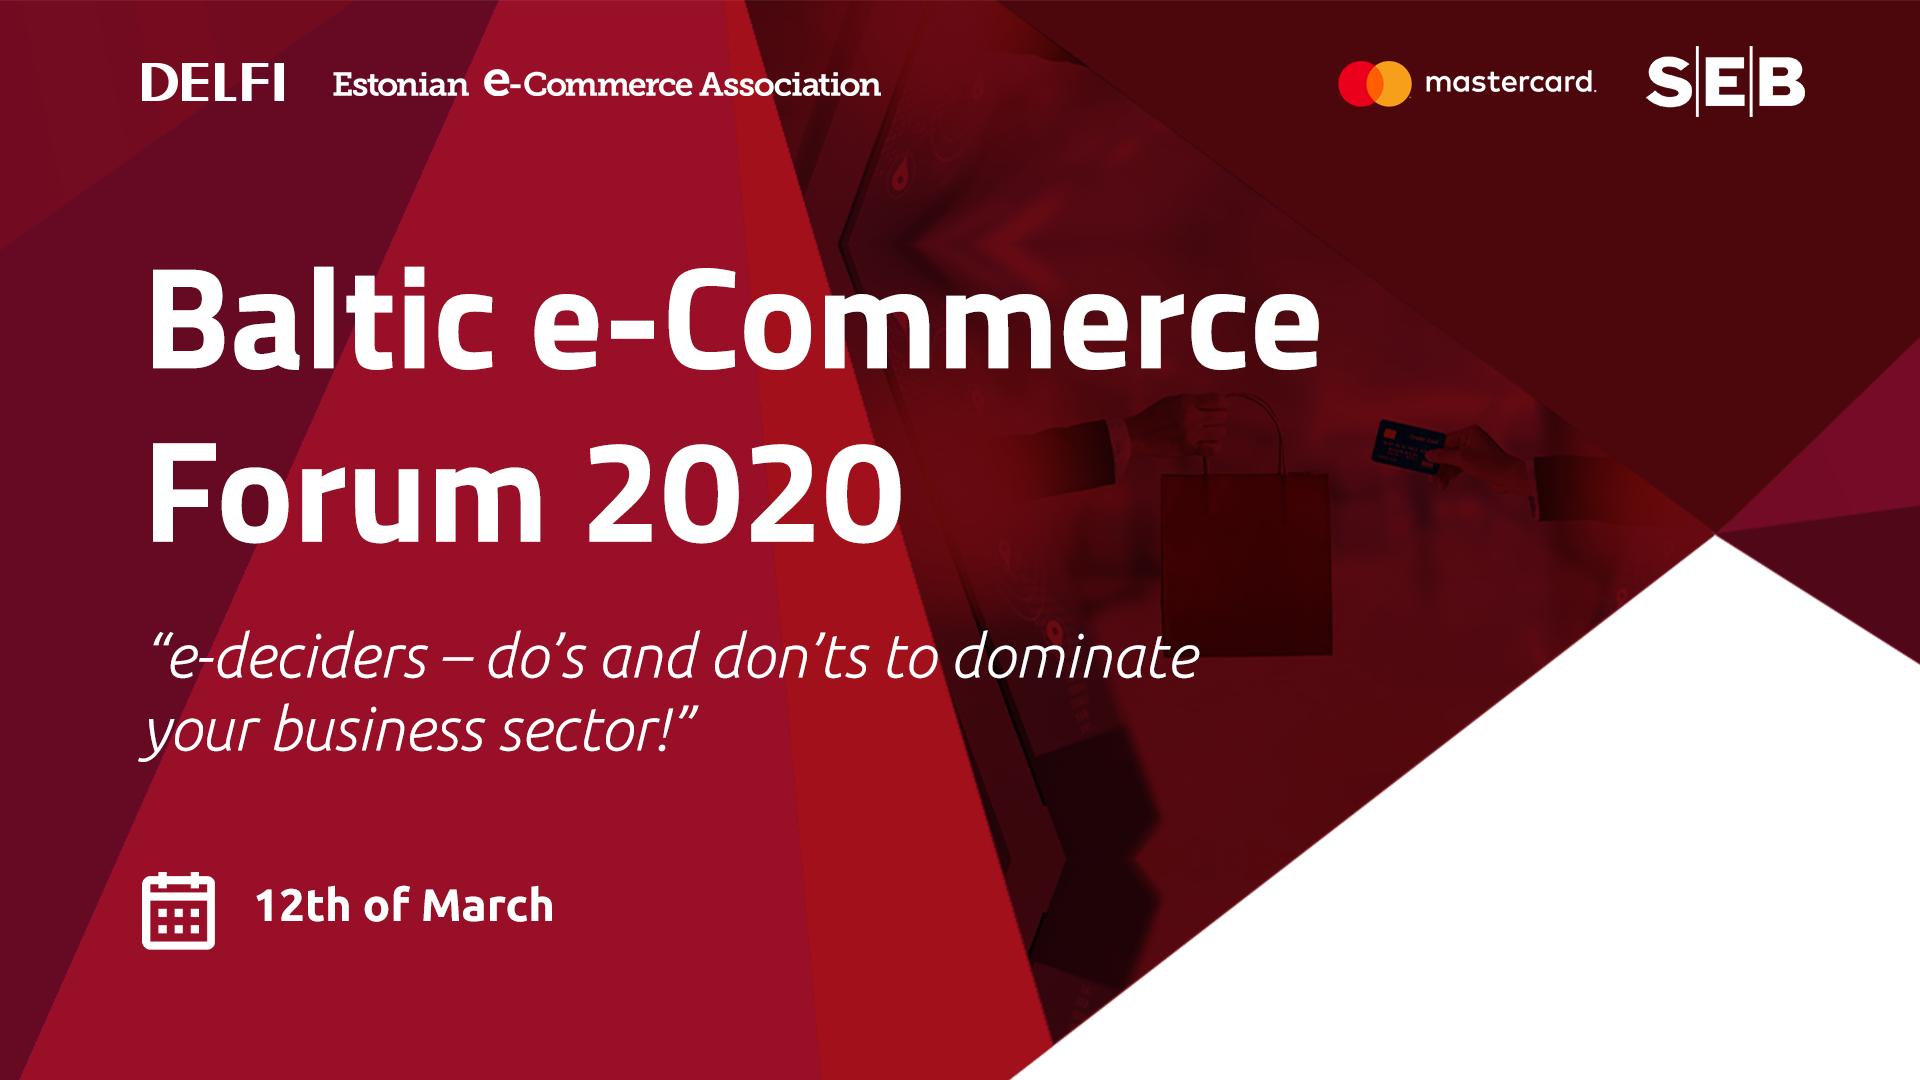 Baltic e-Commerce Forum 2020